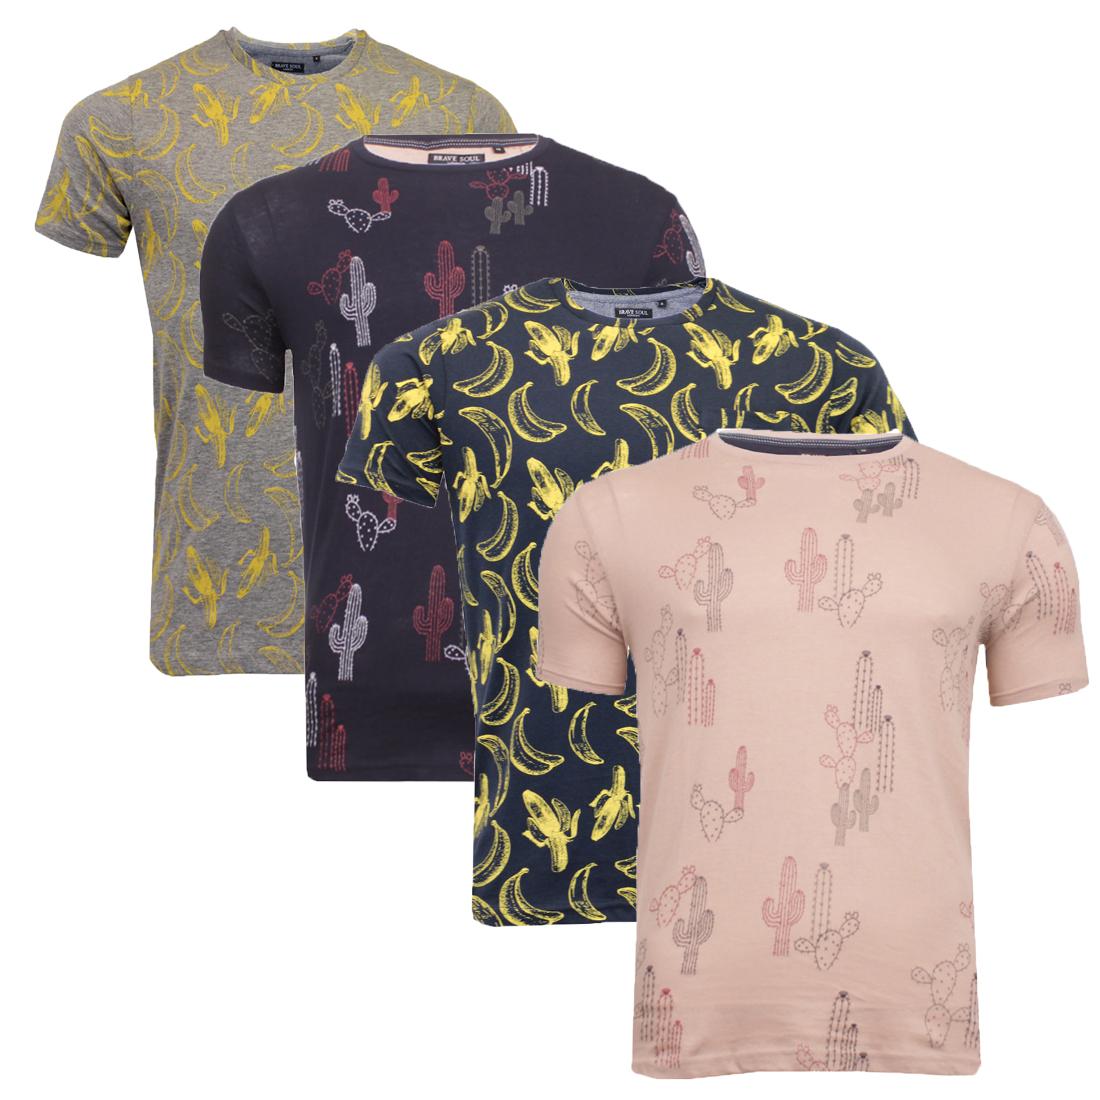 Mens brave soul photo print t shirts graphic or plain for Plain t shirts to print on